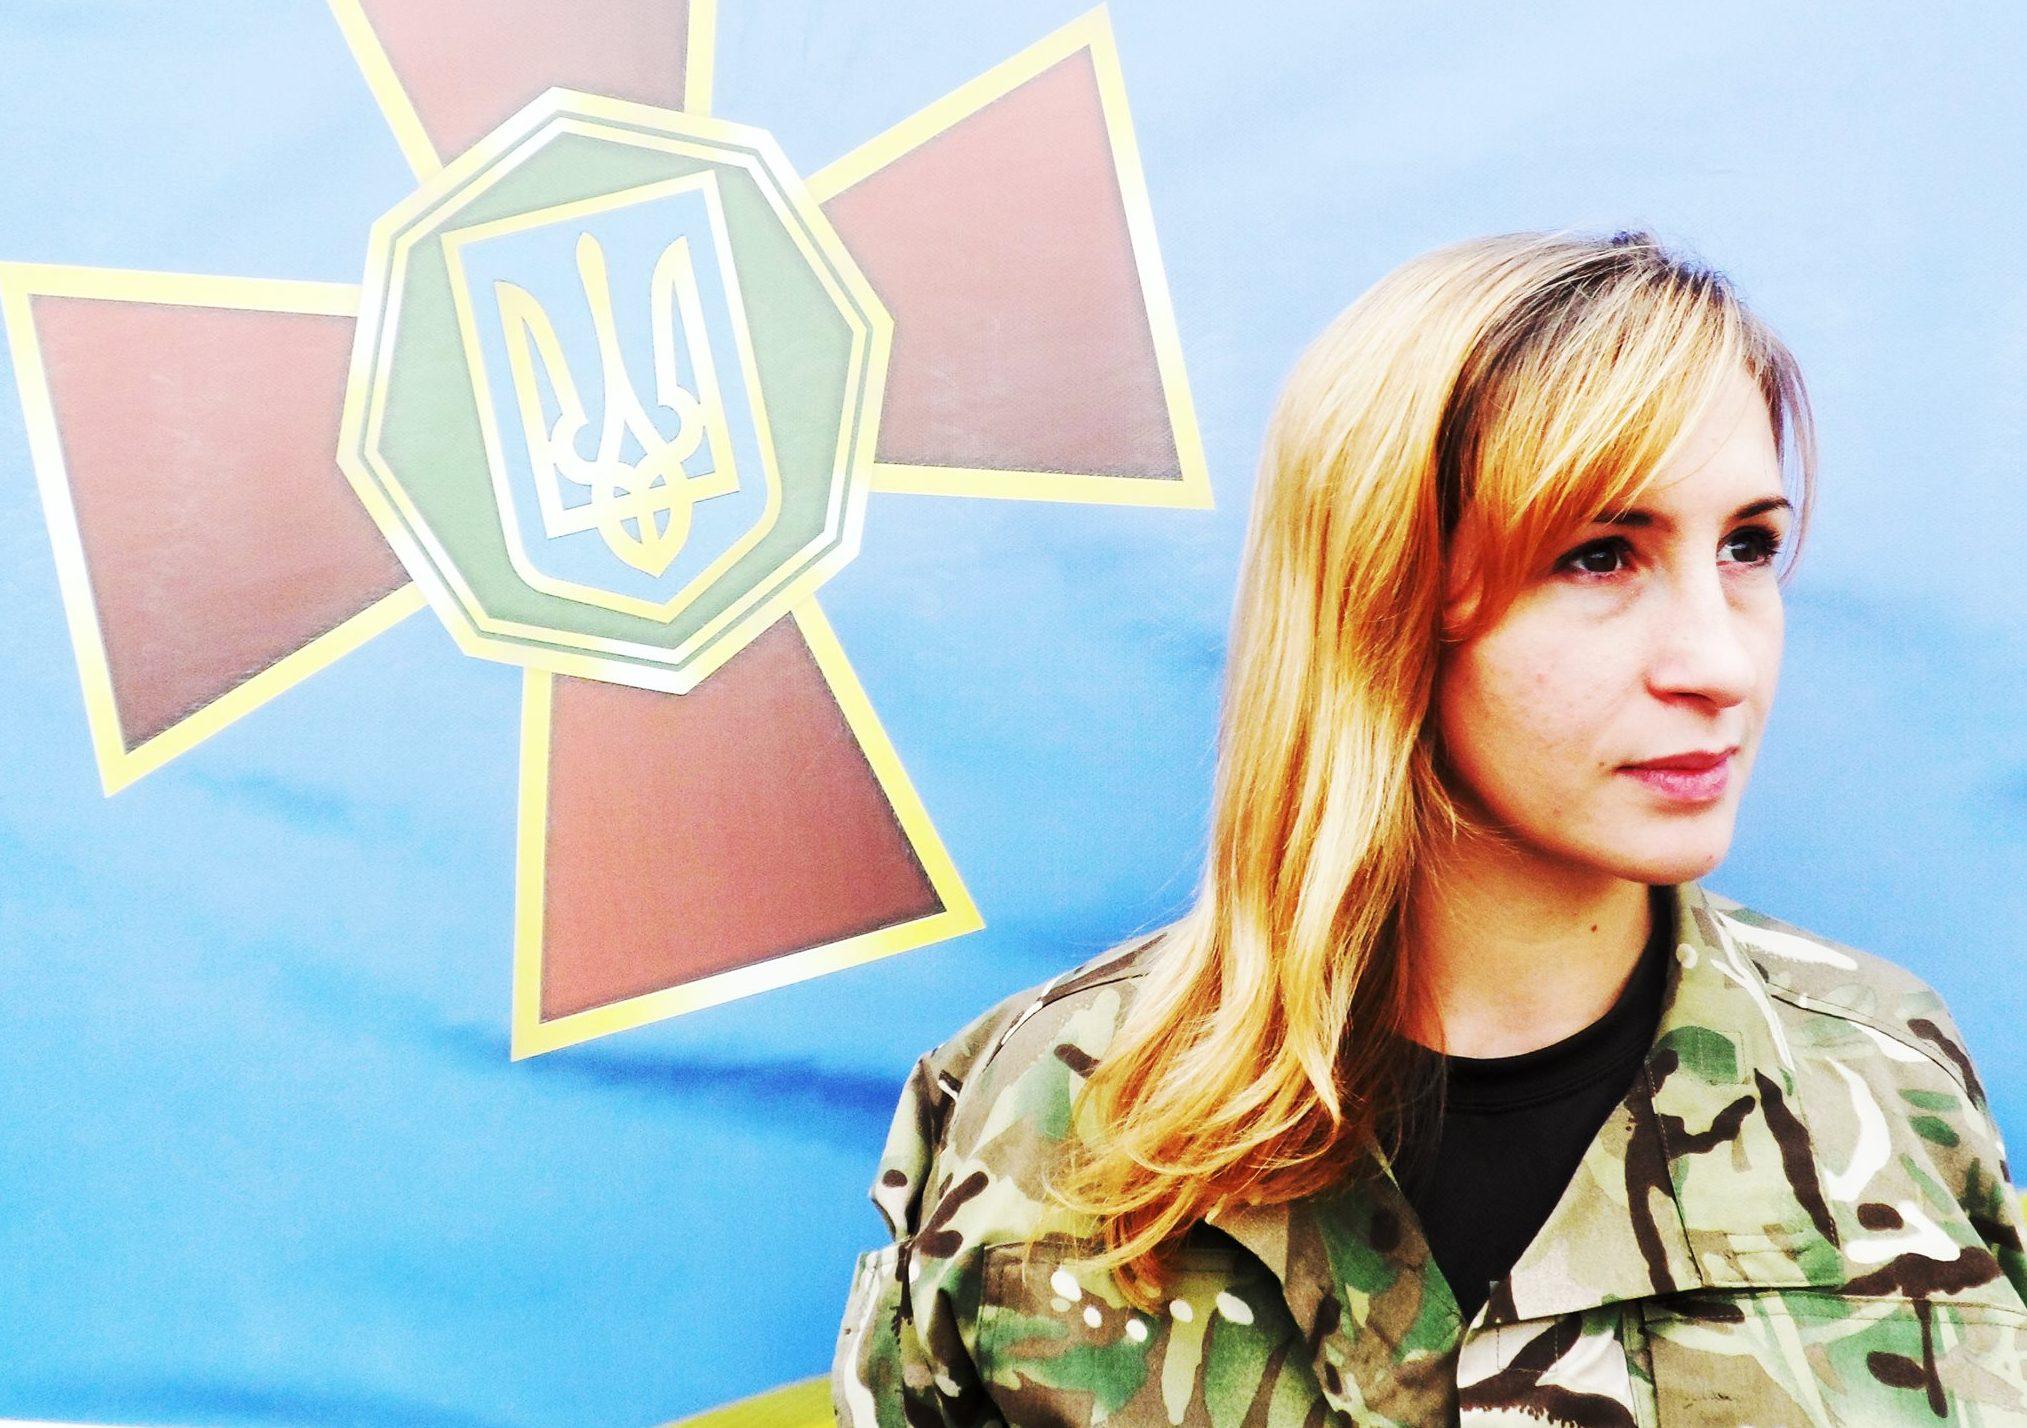 """Я підтримую Порошенка, бо переживаю за Україну"", – Майя Москвич"